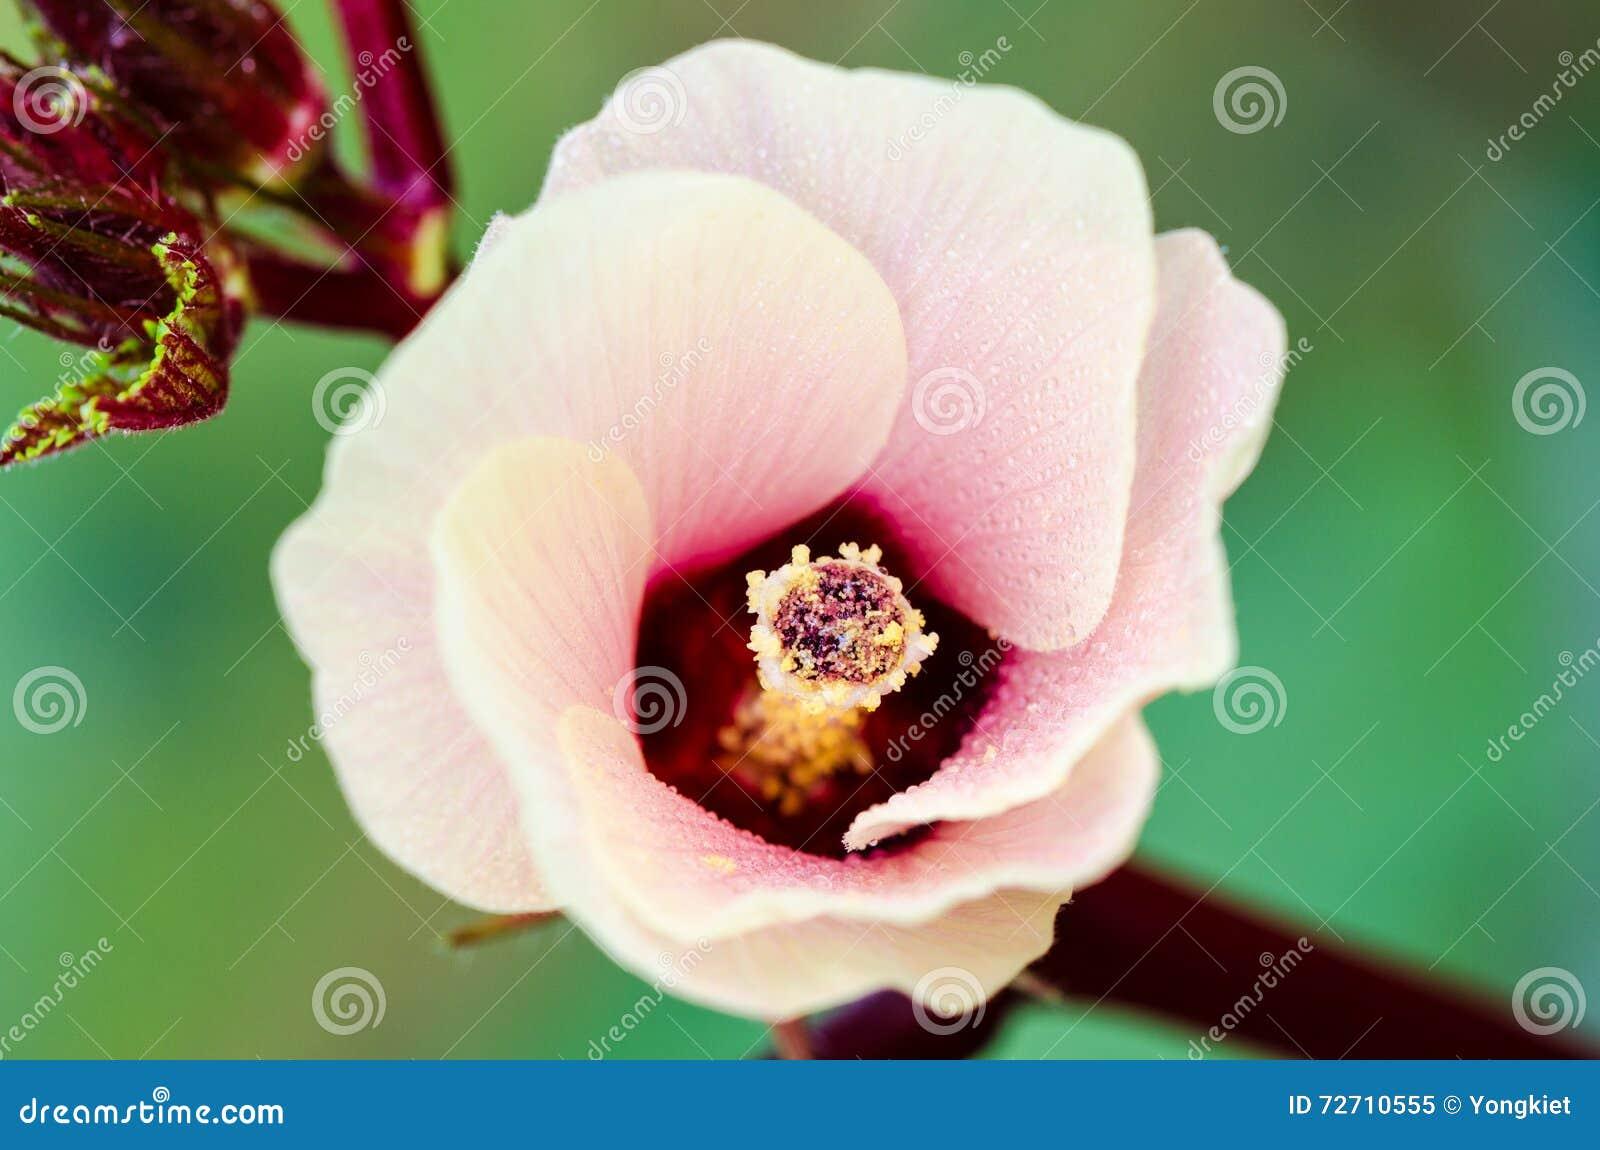 Jamaica sorrel or hibiscus sabdariffa flower stock image image of jamaica sorrel or hibiscus sabdariffa flower macro green izmirmasajfo Choice Image